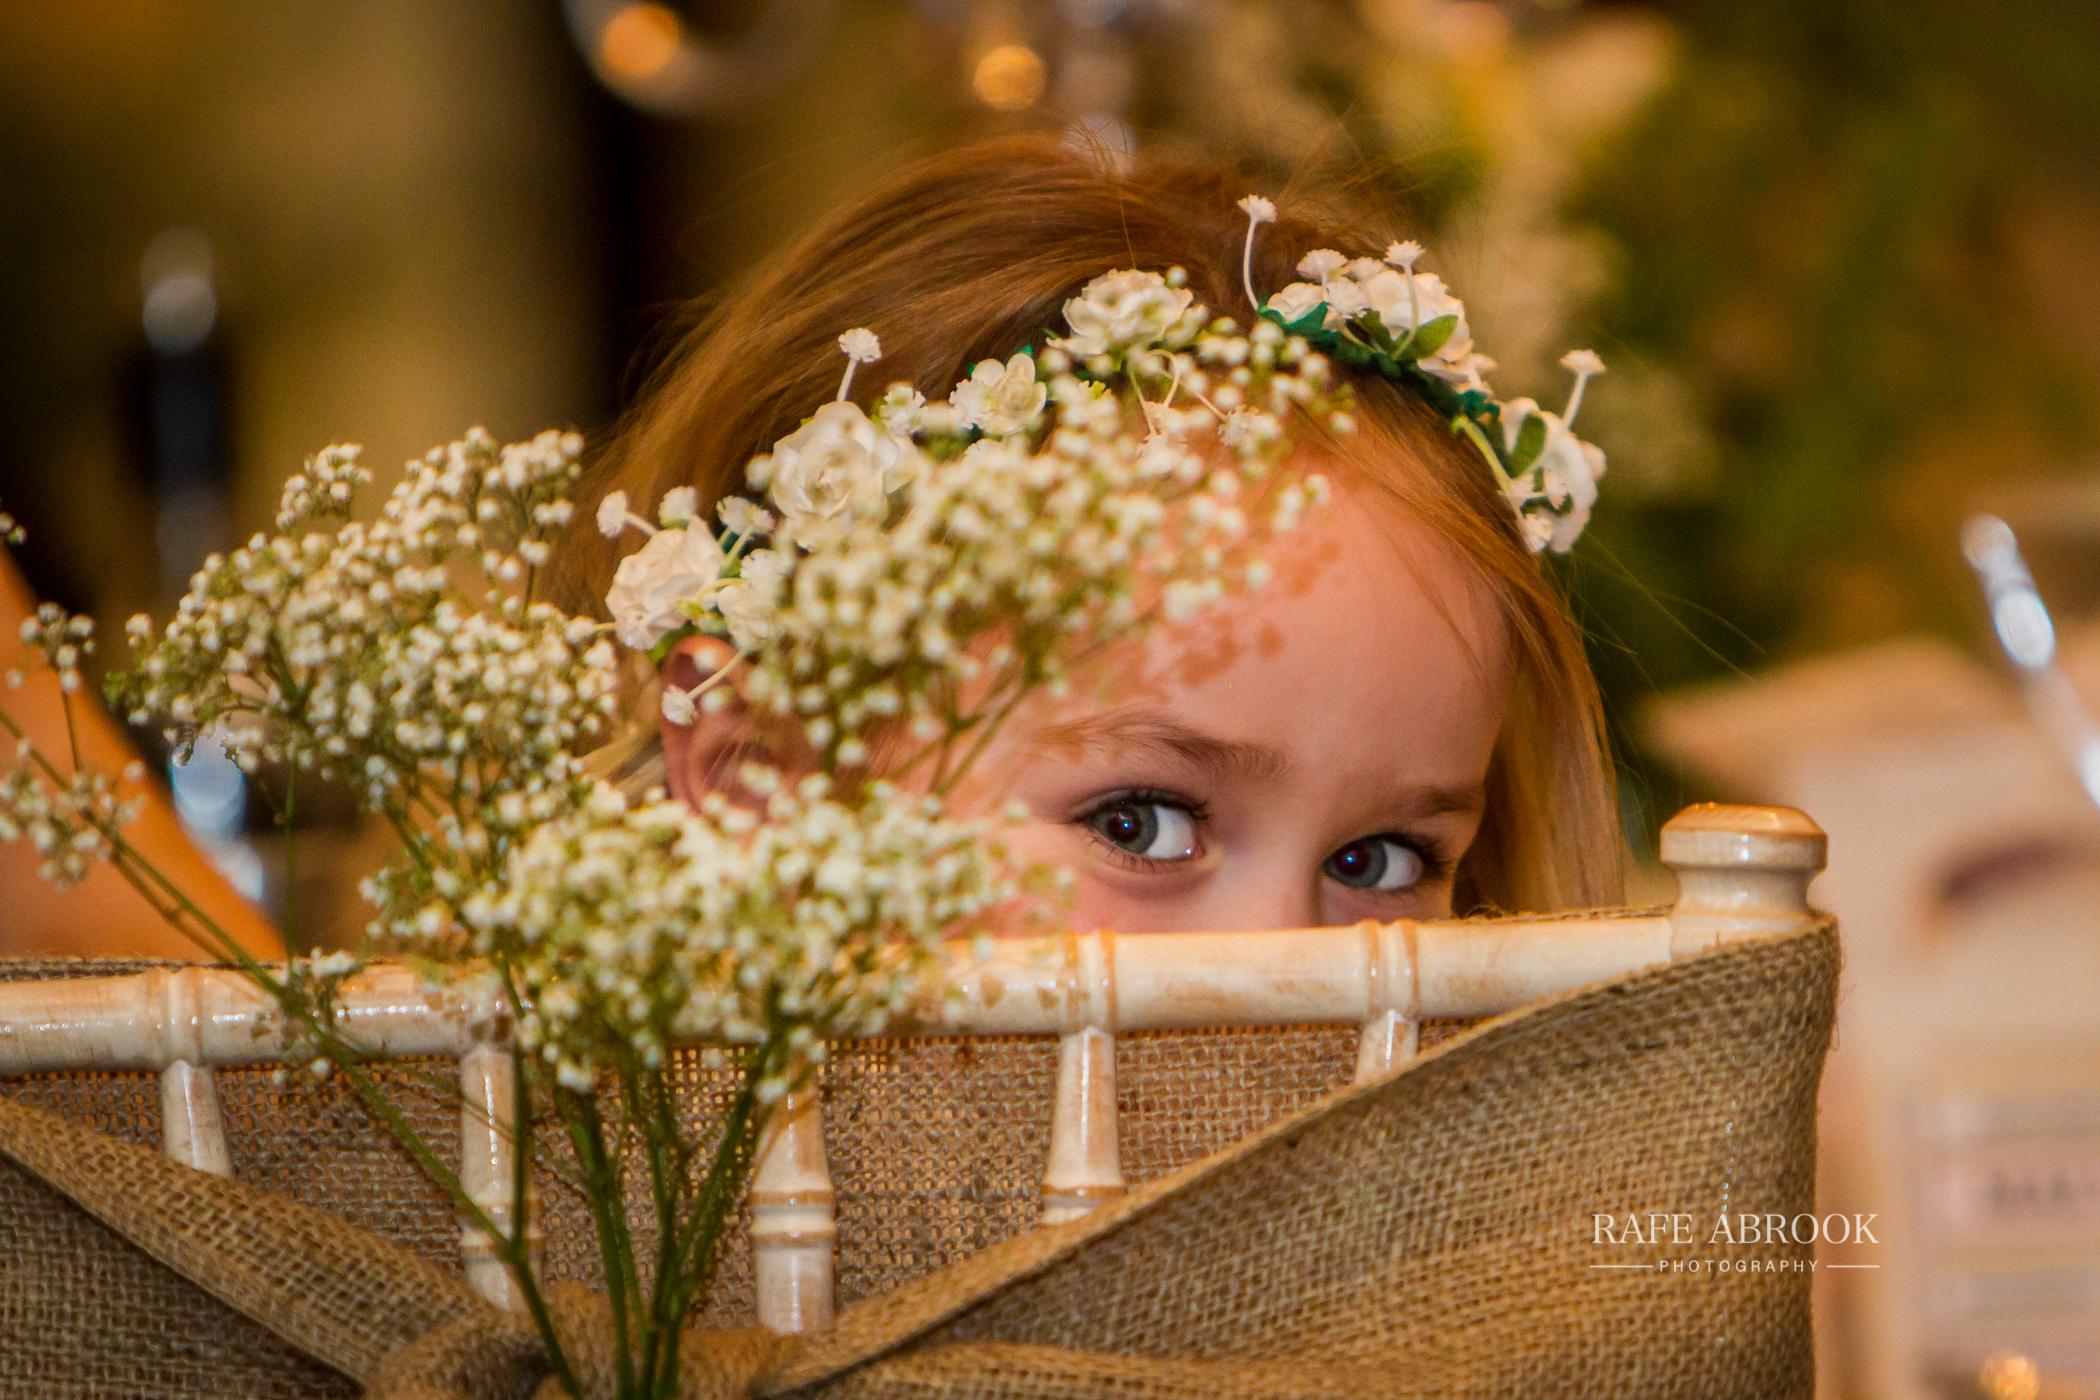 roma & pete wedding hampstead shenley hertfordshire -383.jpg